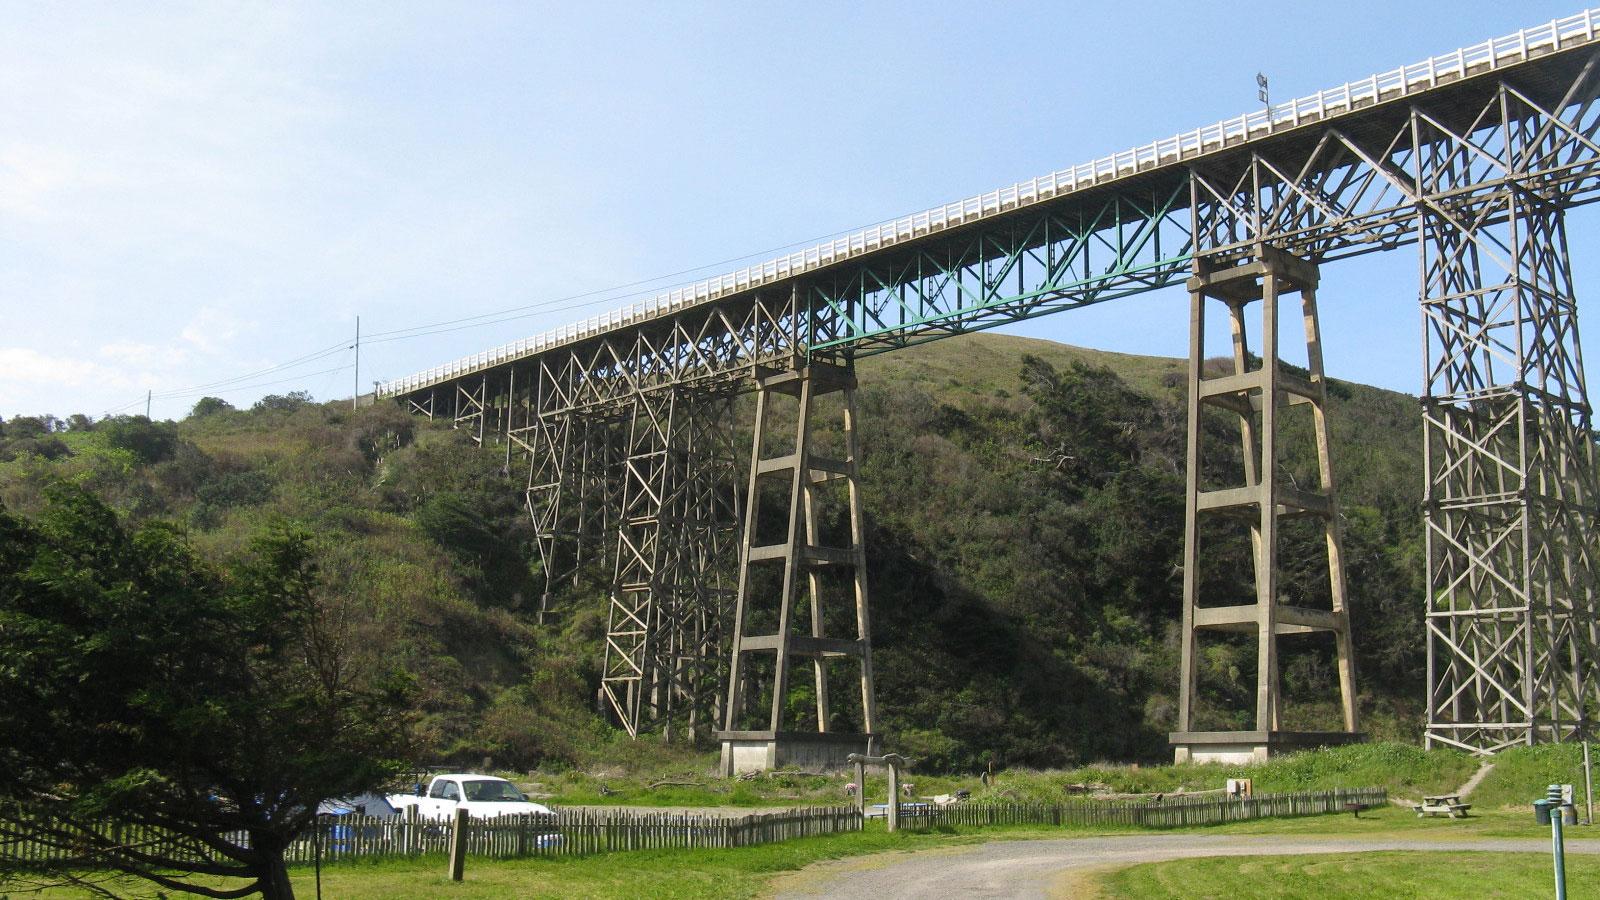 albion river bridge